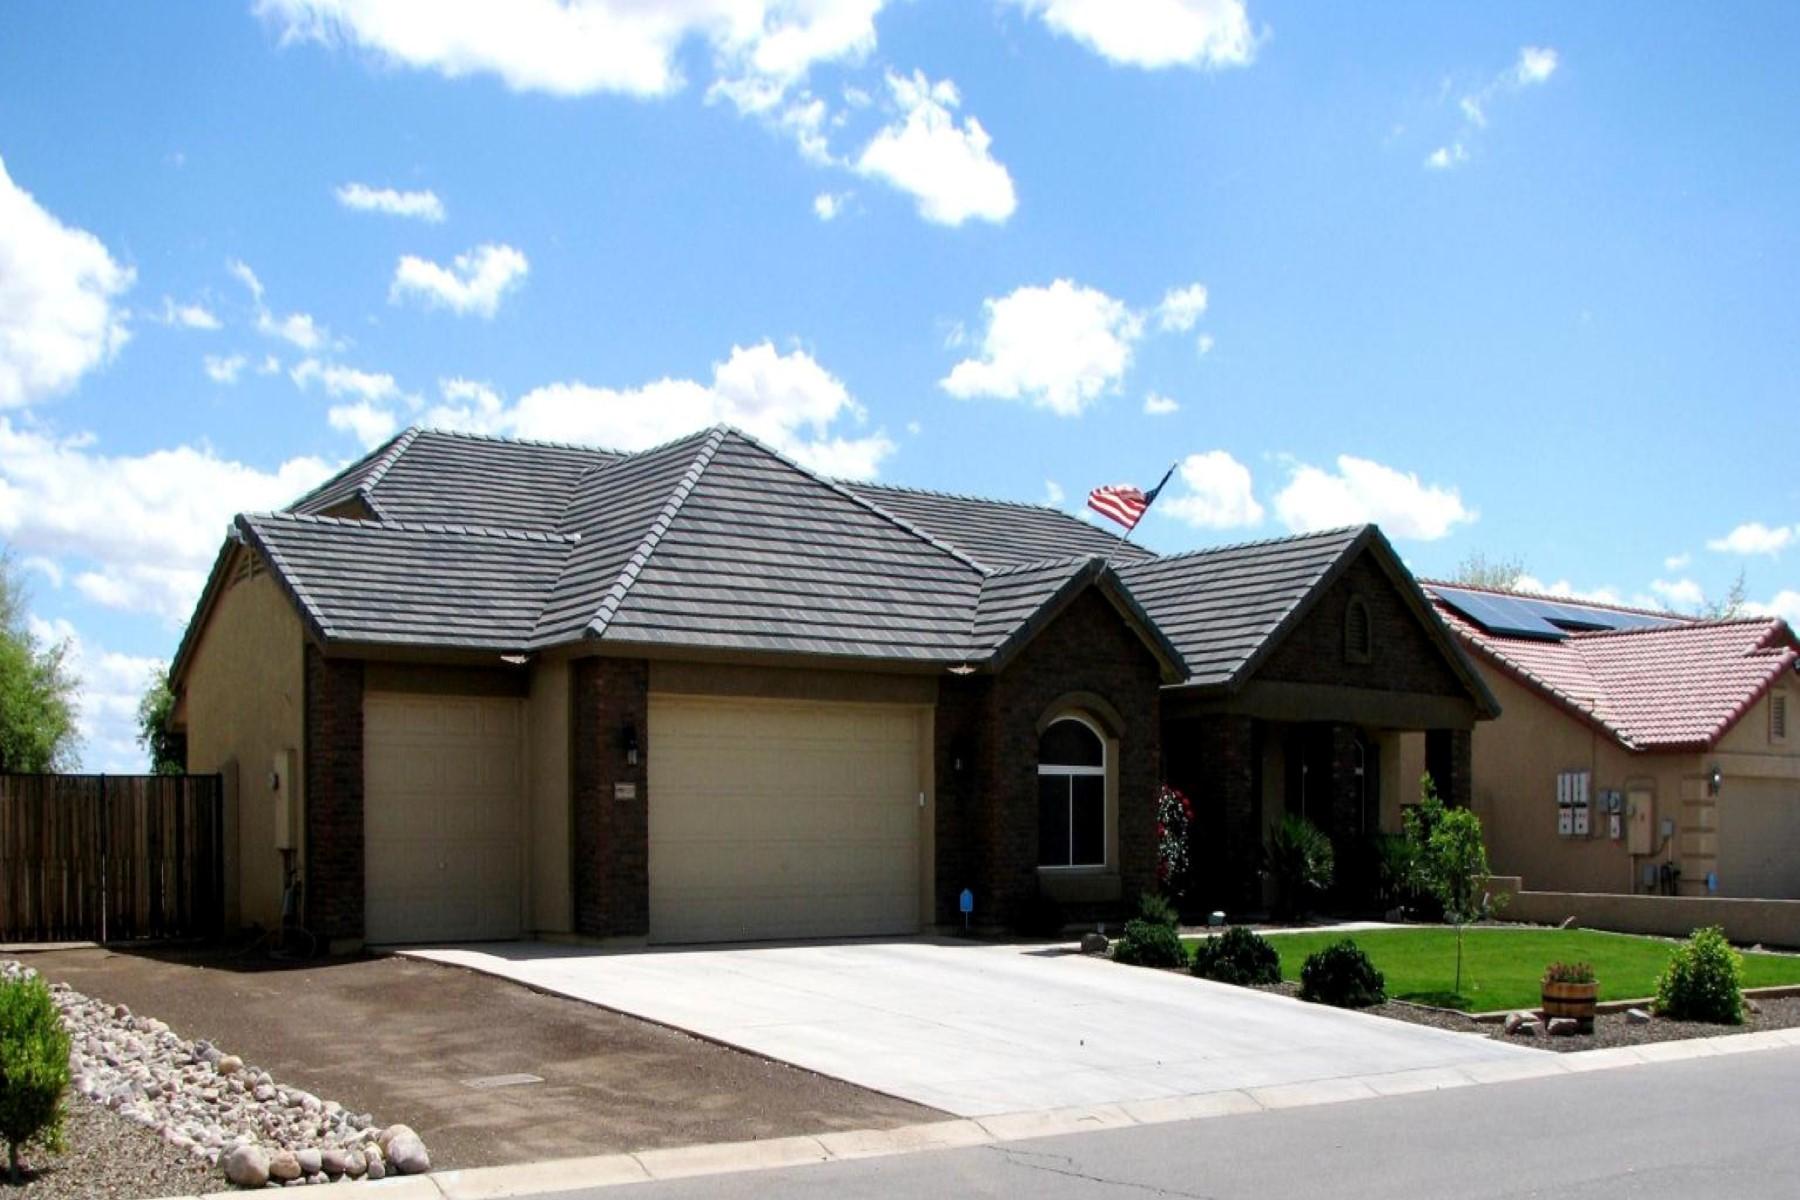 獨棟家庭住宅 為 出售 在 Executive style meets country living 39525 N Oxford Way San Tan Valley, 亞利桑那州, 85140 美國